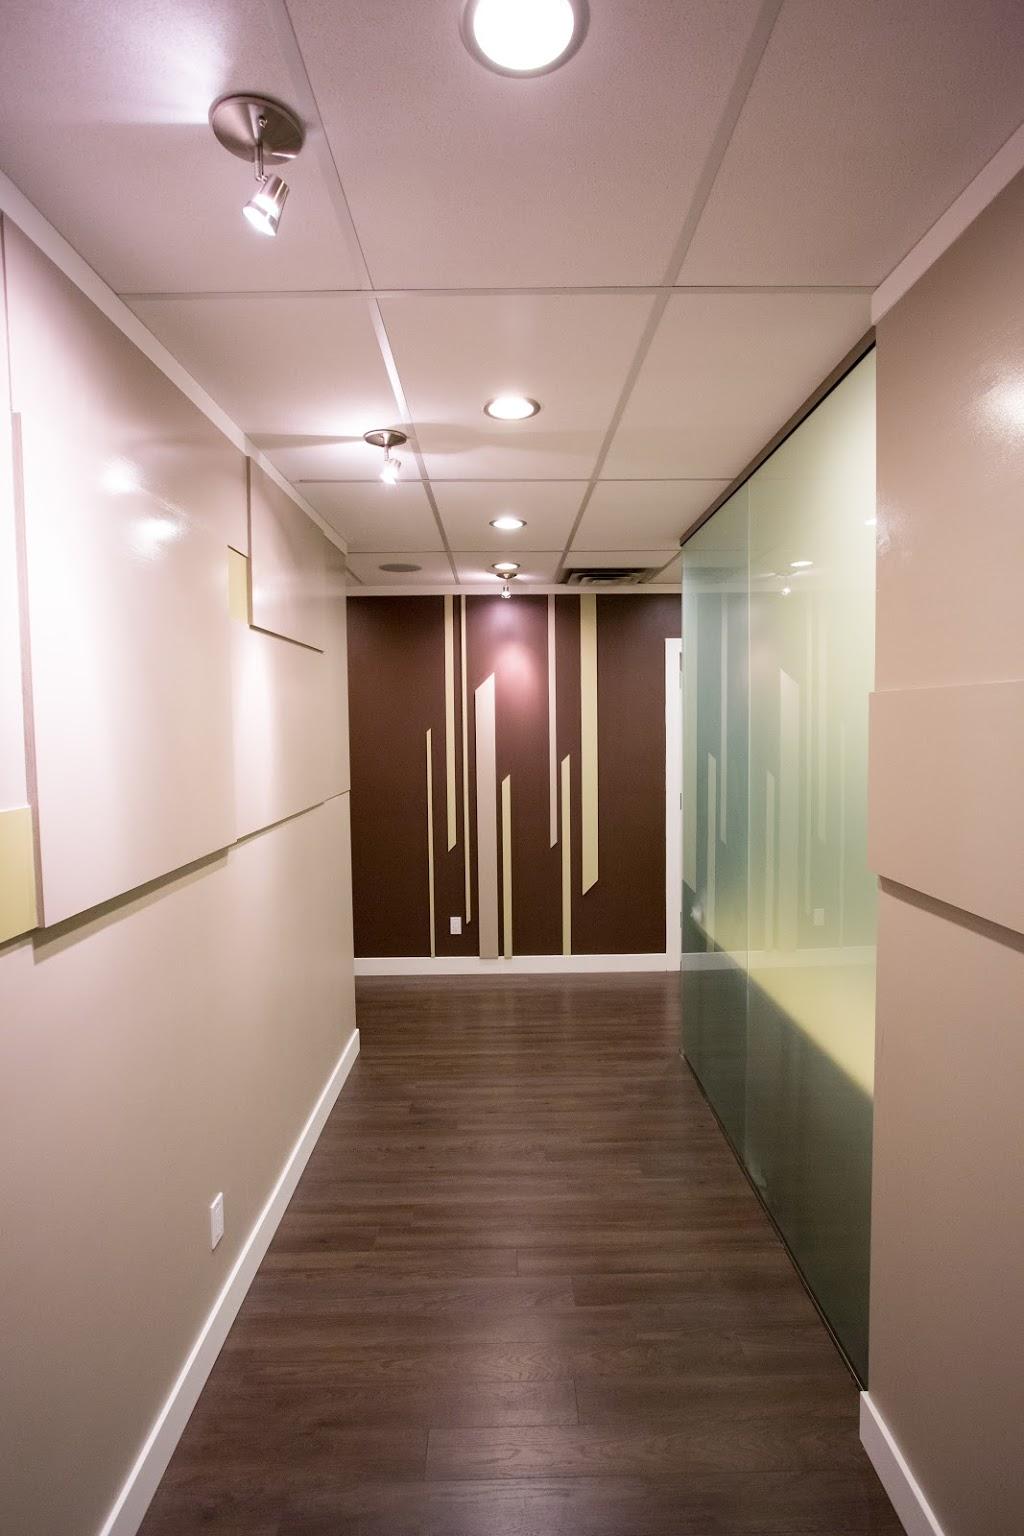 Burquitlam Medical Clinic | health | 504 Cottonwood Ave, Coquitlam, BC V3J 2R5, Canada | 6049398831 OR +1 604-939-8831